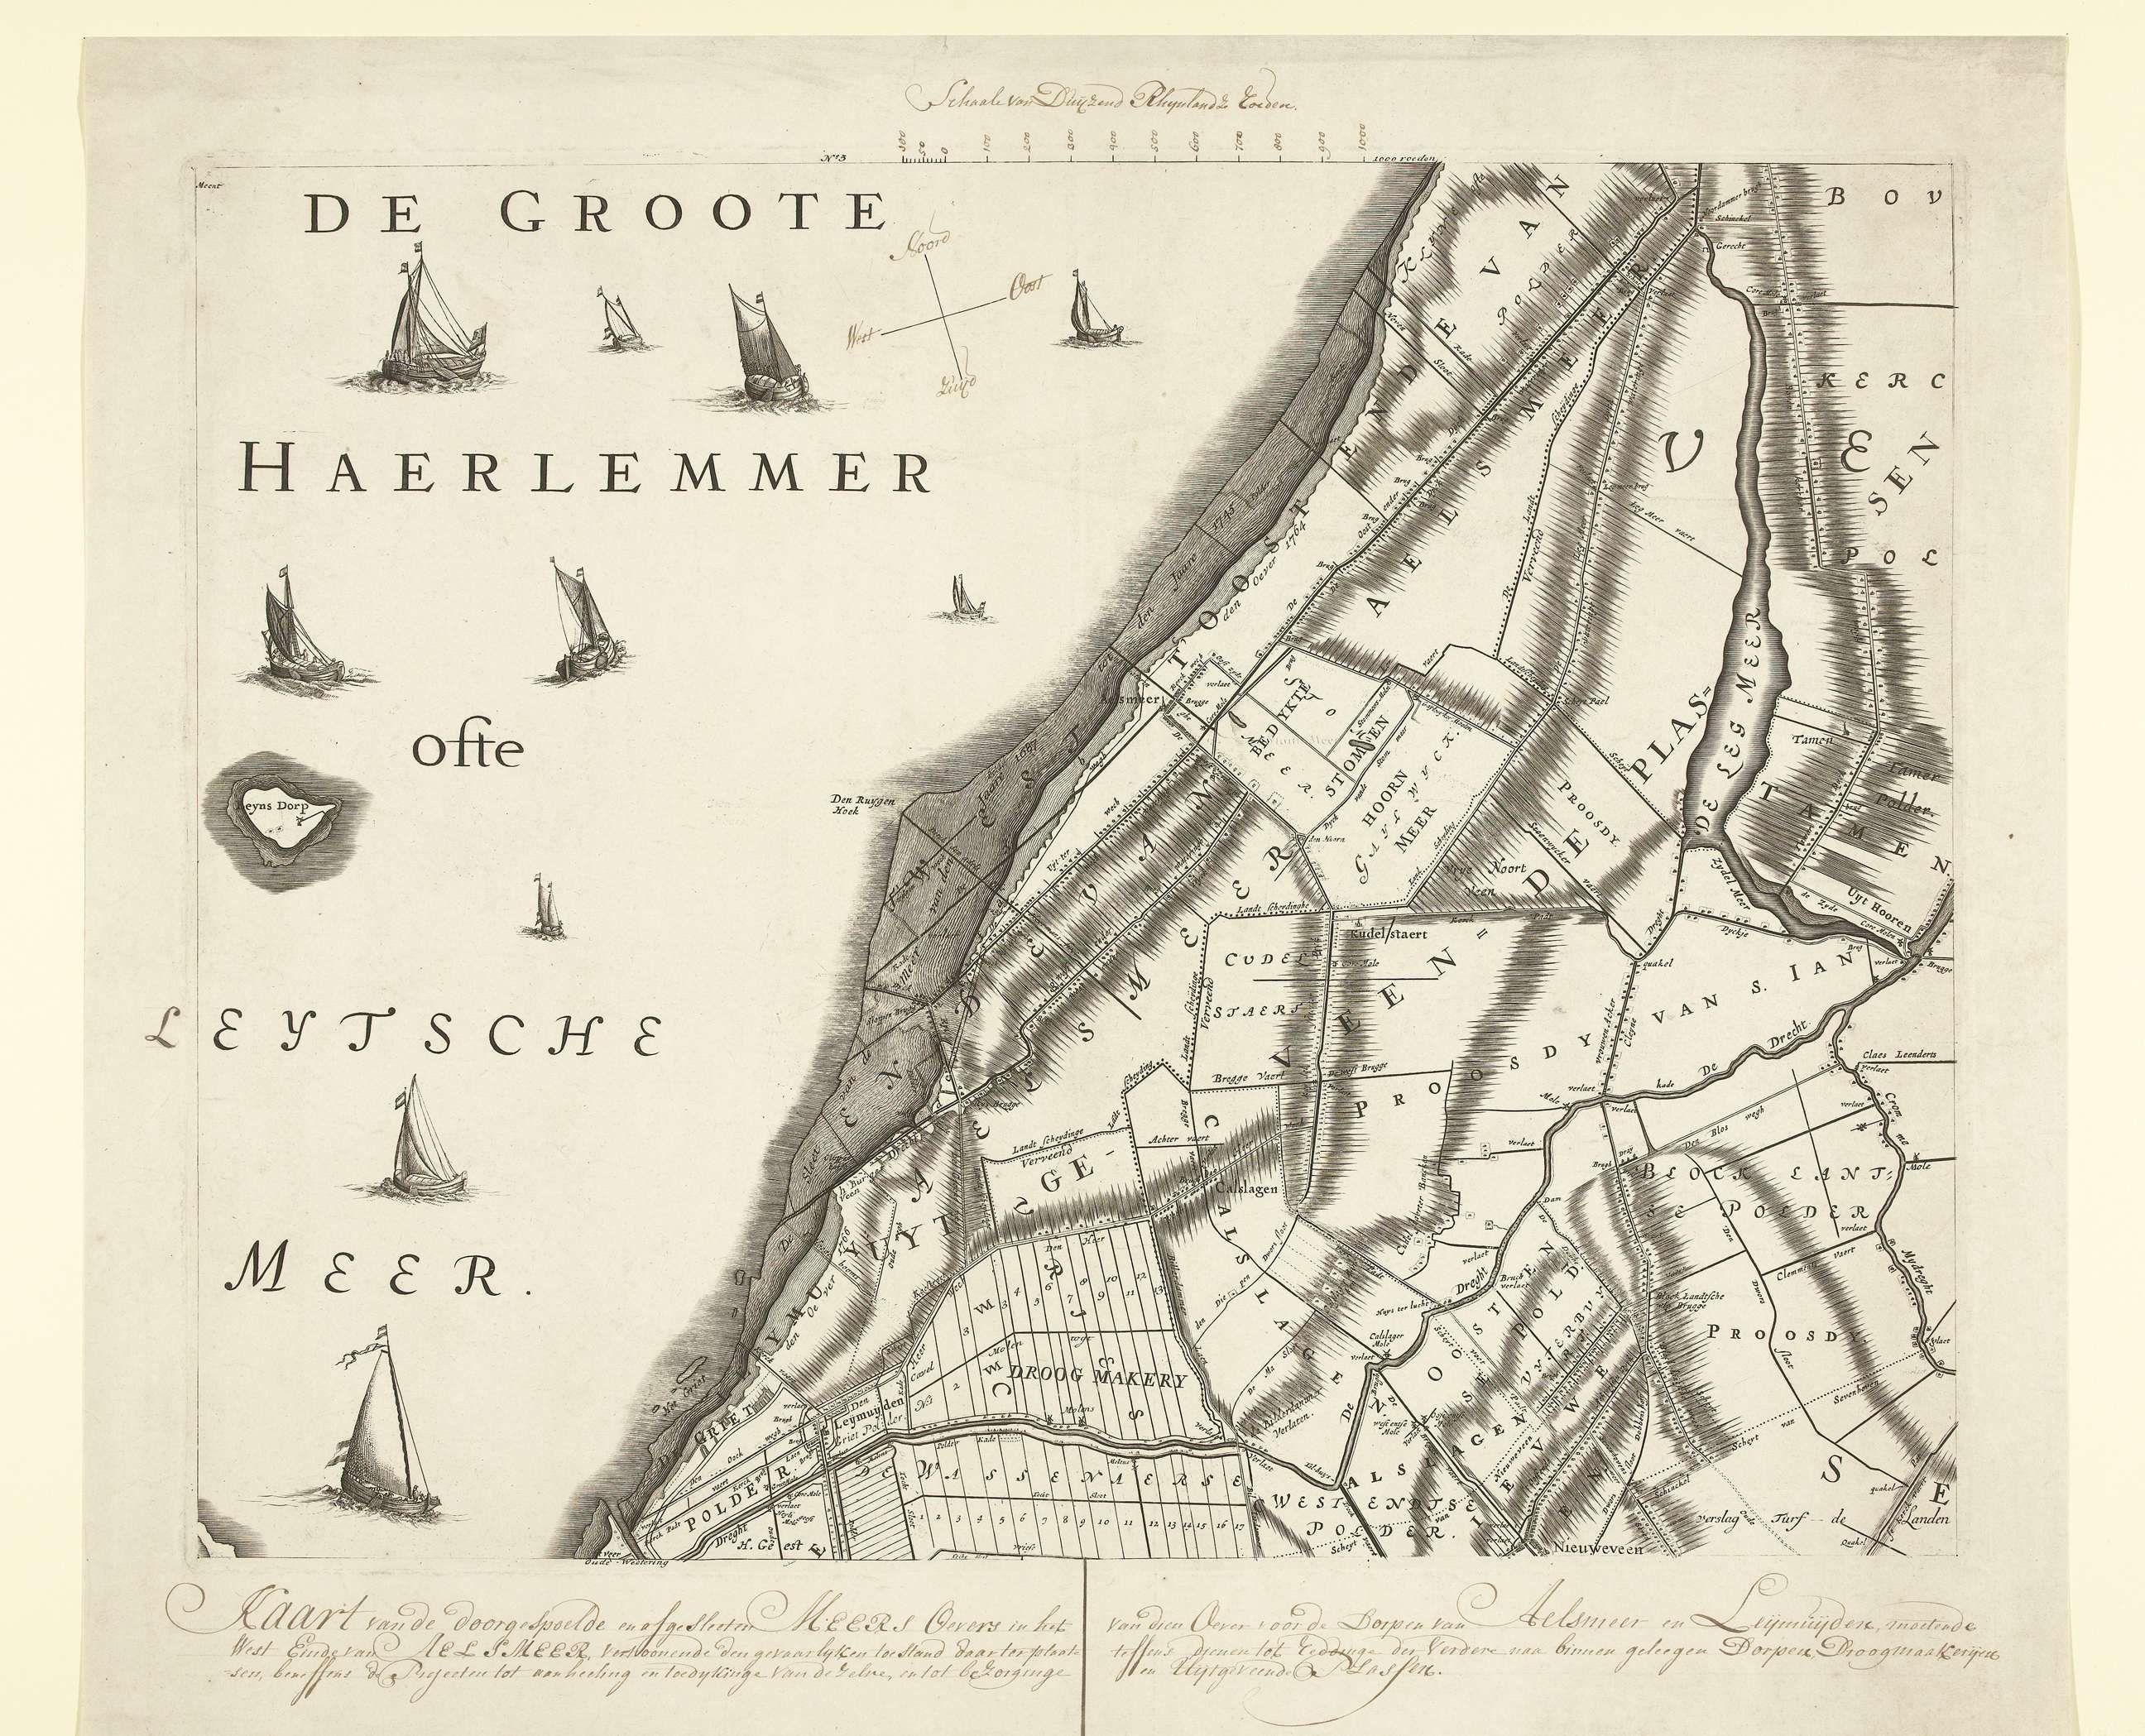 Anonymous Kaart met de oude oevers van de Haarlemmermeer ca 1770